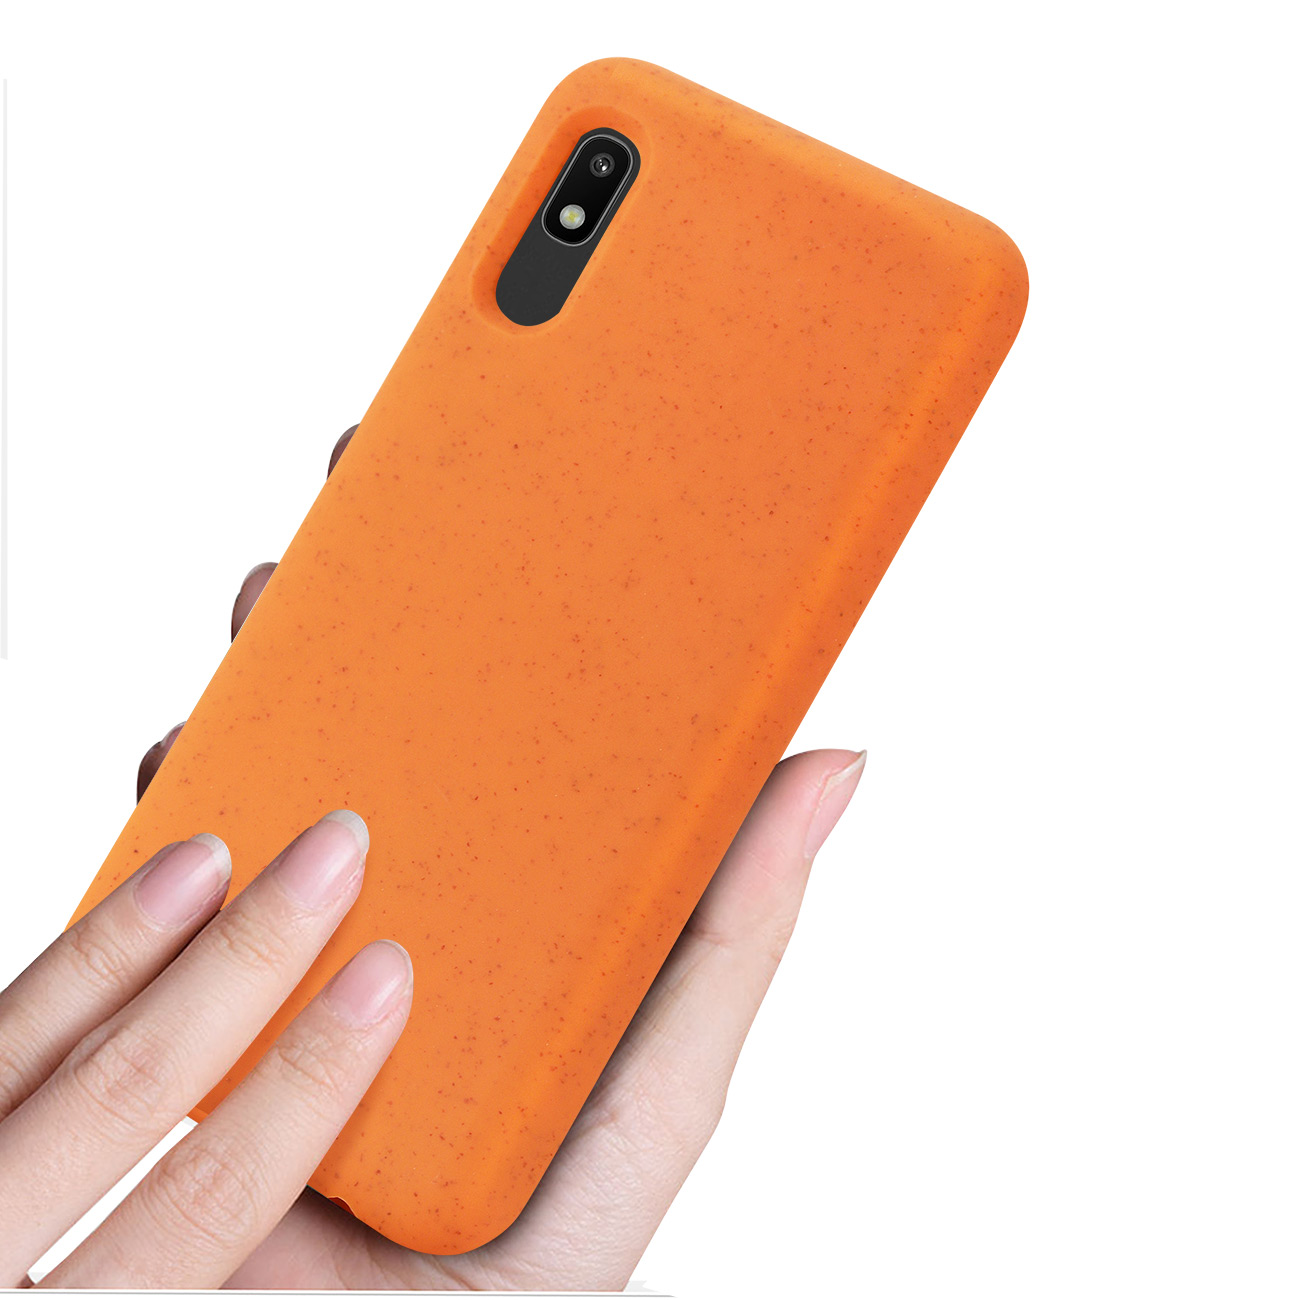 SAMSUNG GALAXY A10E Wheat Bran Material Silicone Phone Case In Orange